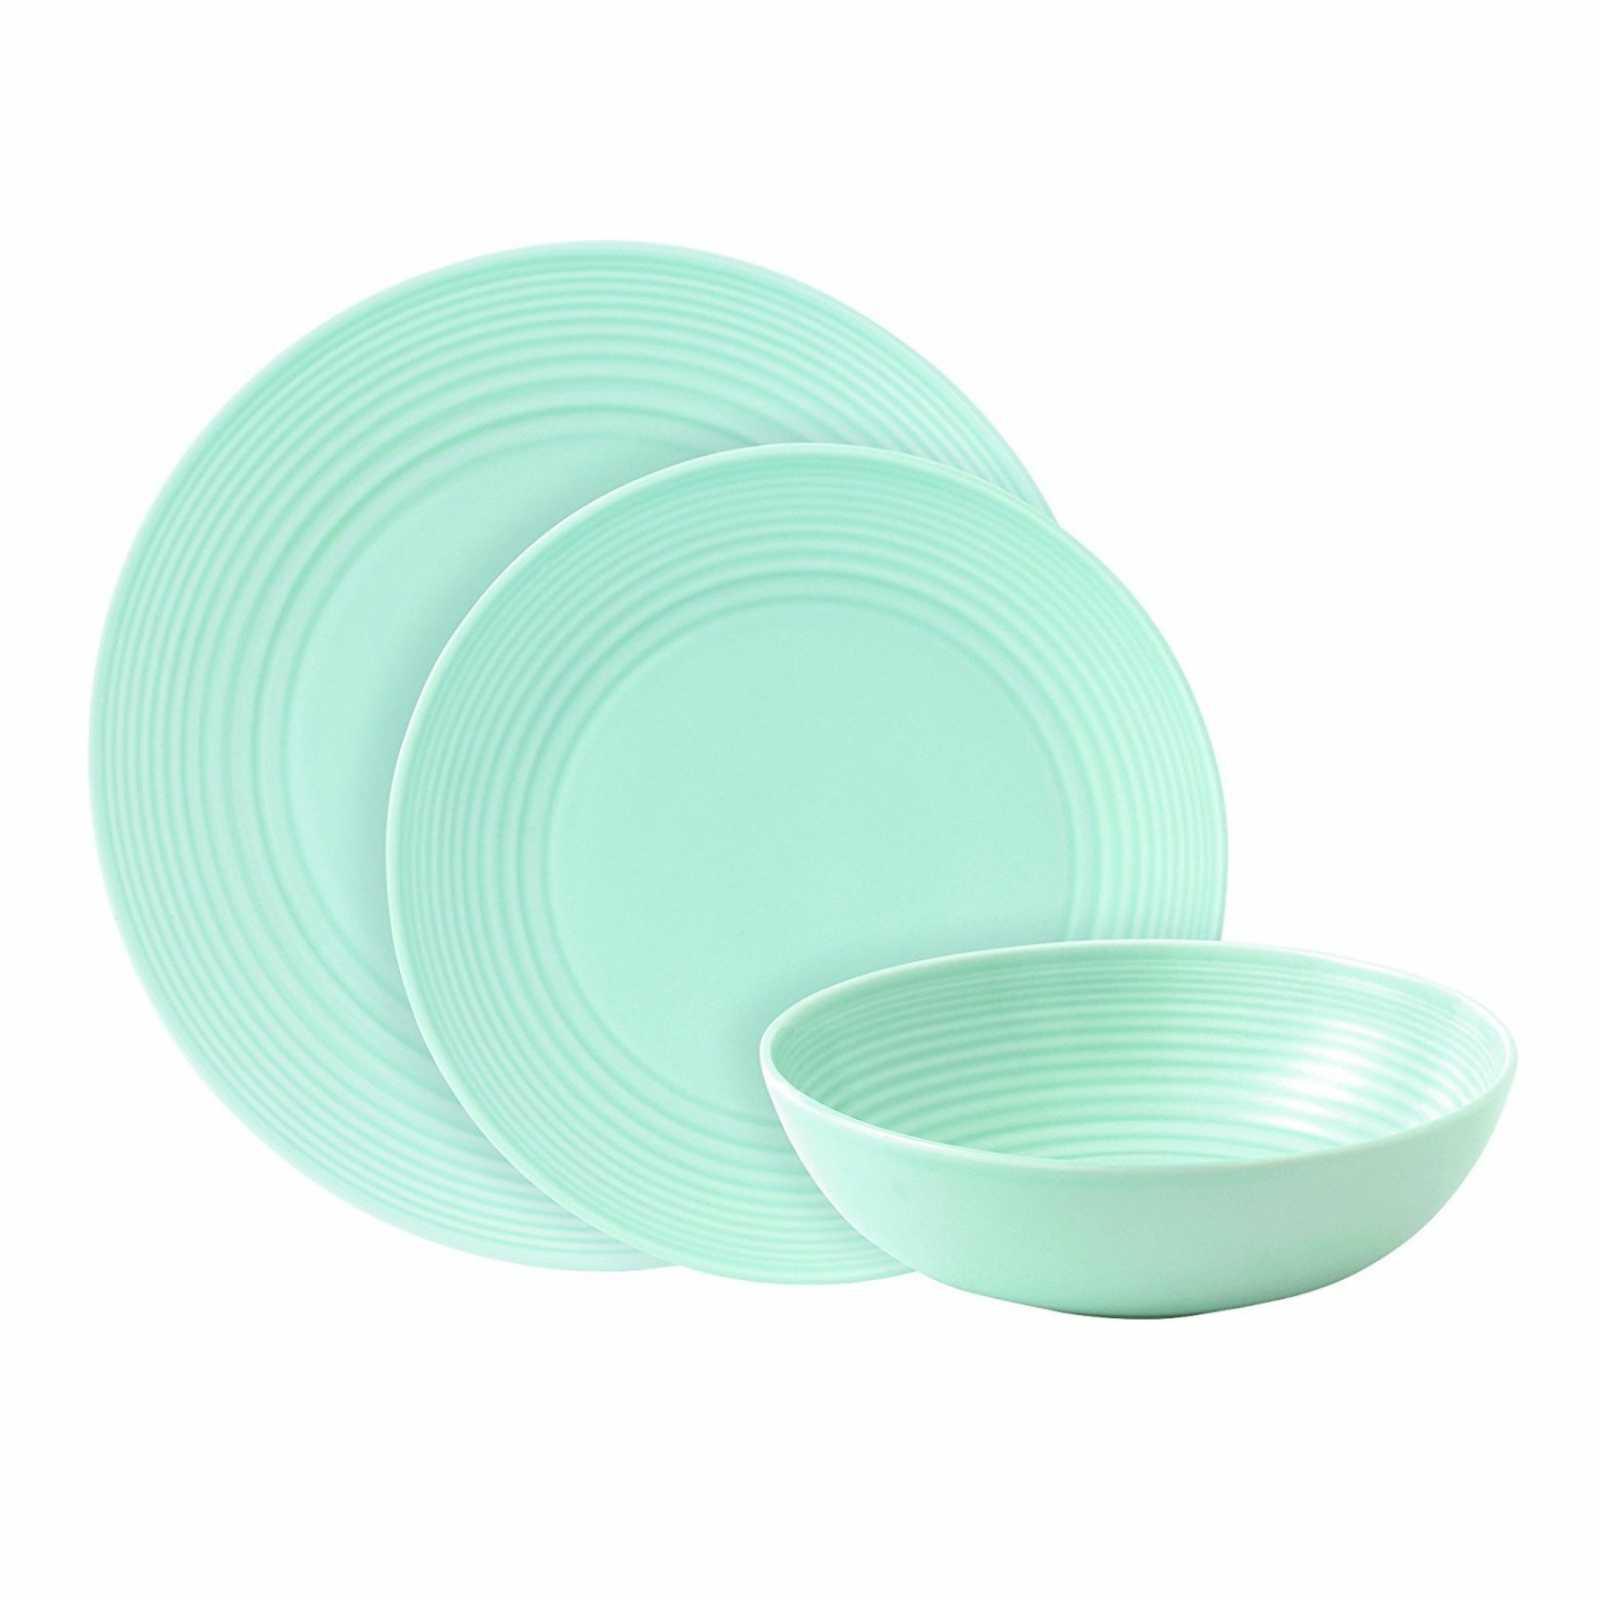 Онлайн каталог PROMENU: Набор столовой посуды Royal Doulton GORDON RAMSAY MAZE BLUE, голубой, 12 предметов                               GRMZBL22417